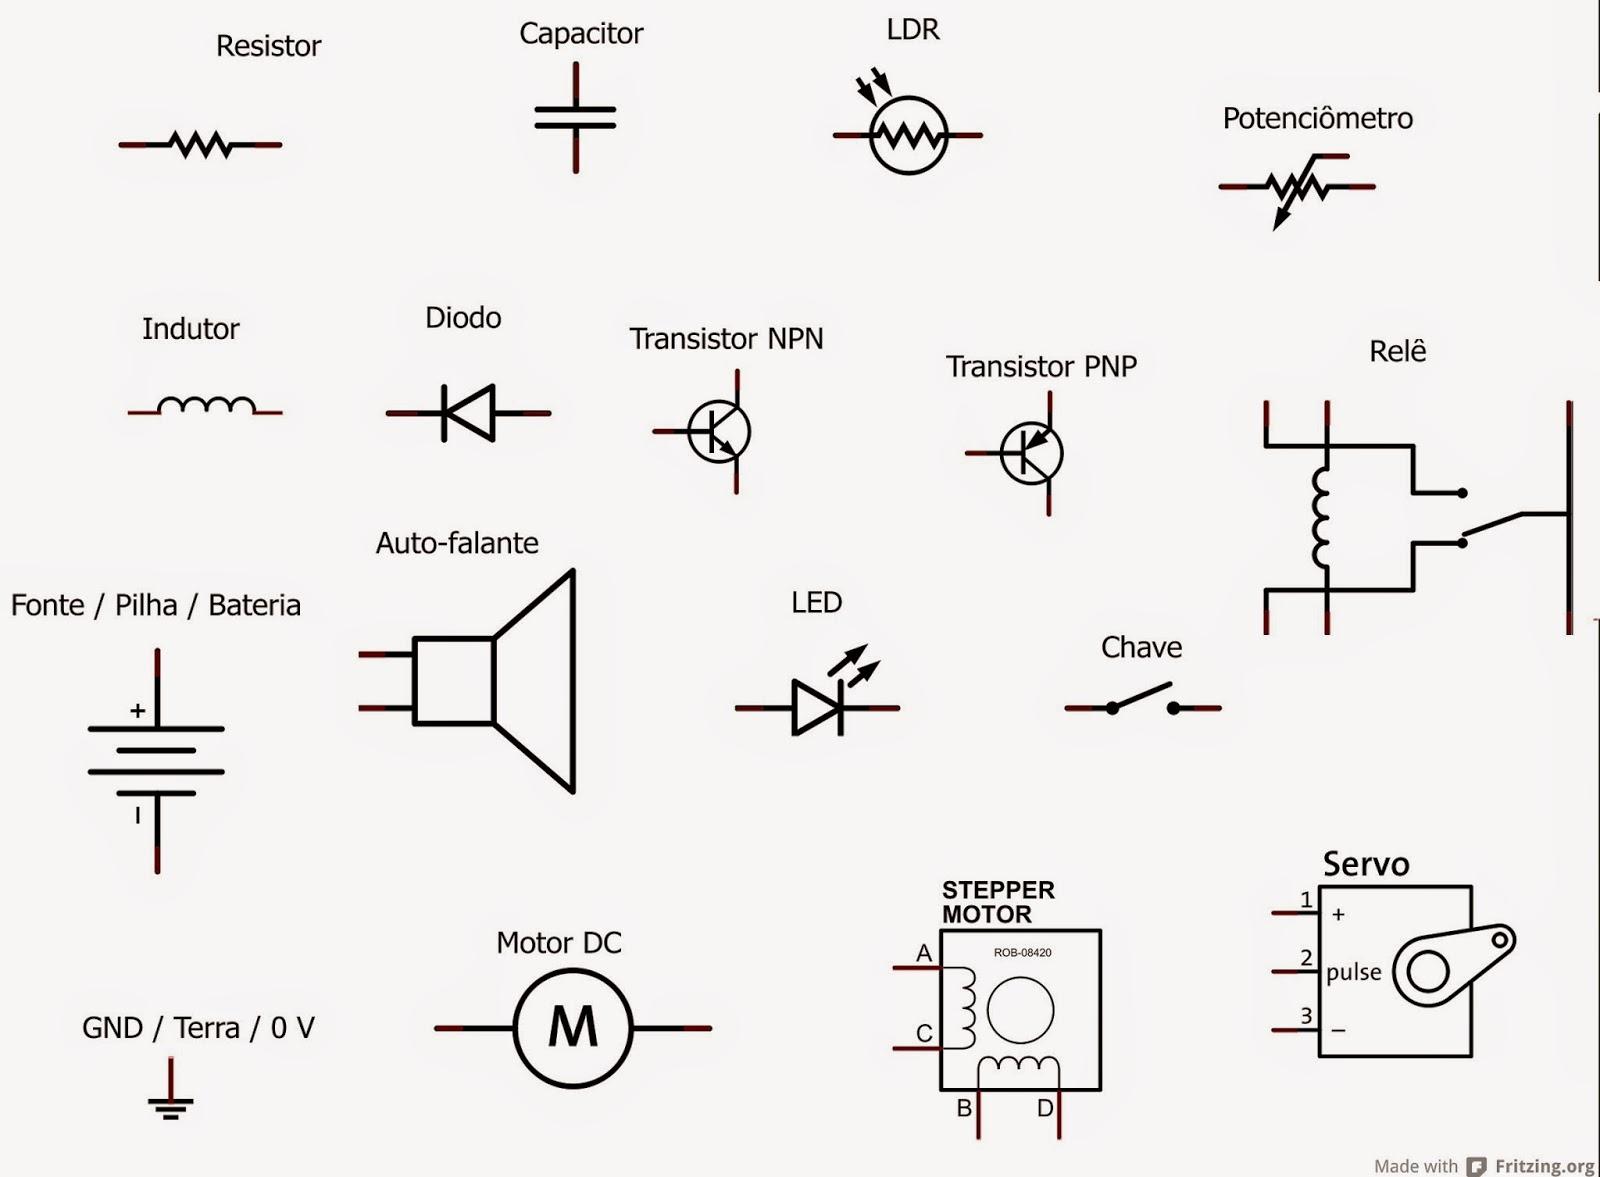 Autocad Resistor Symbol